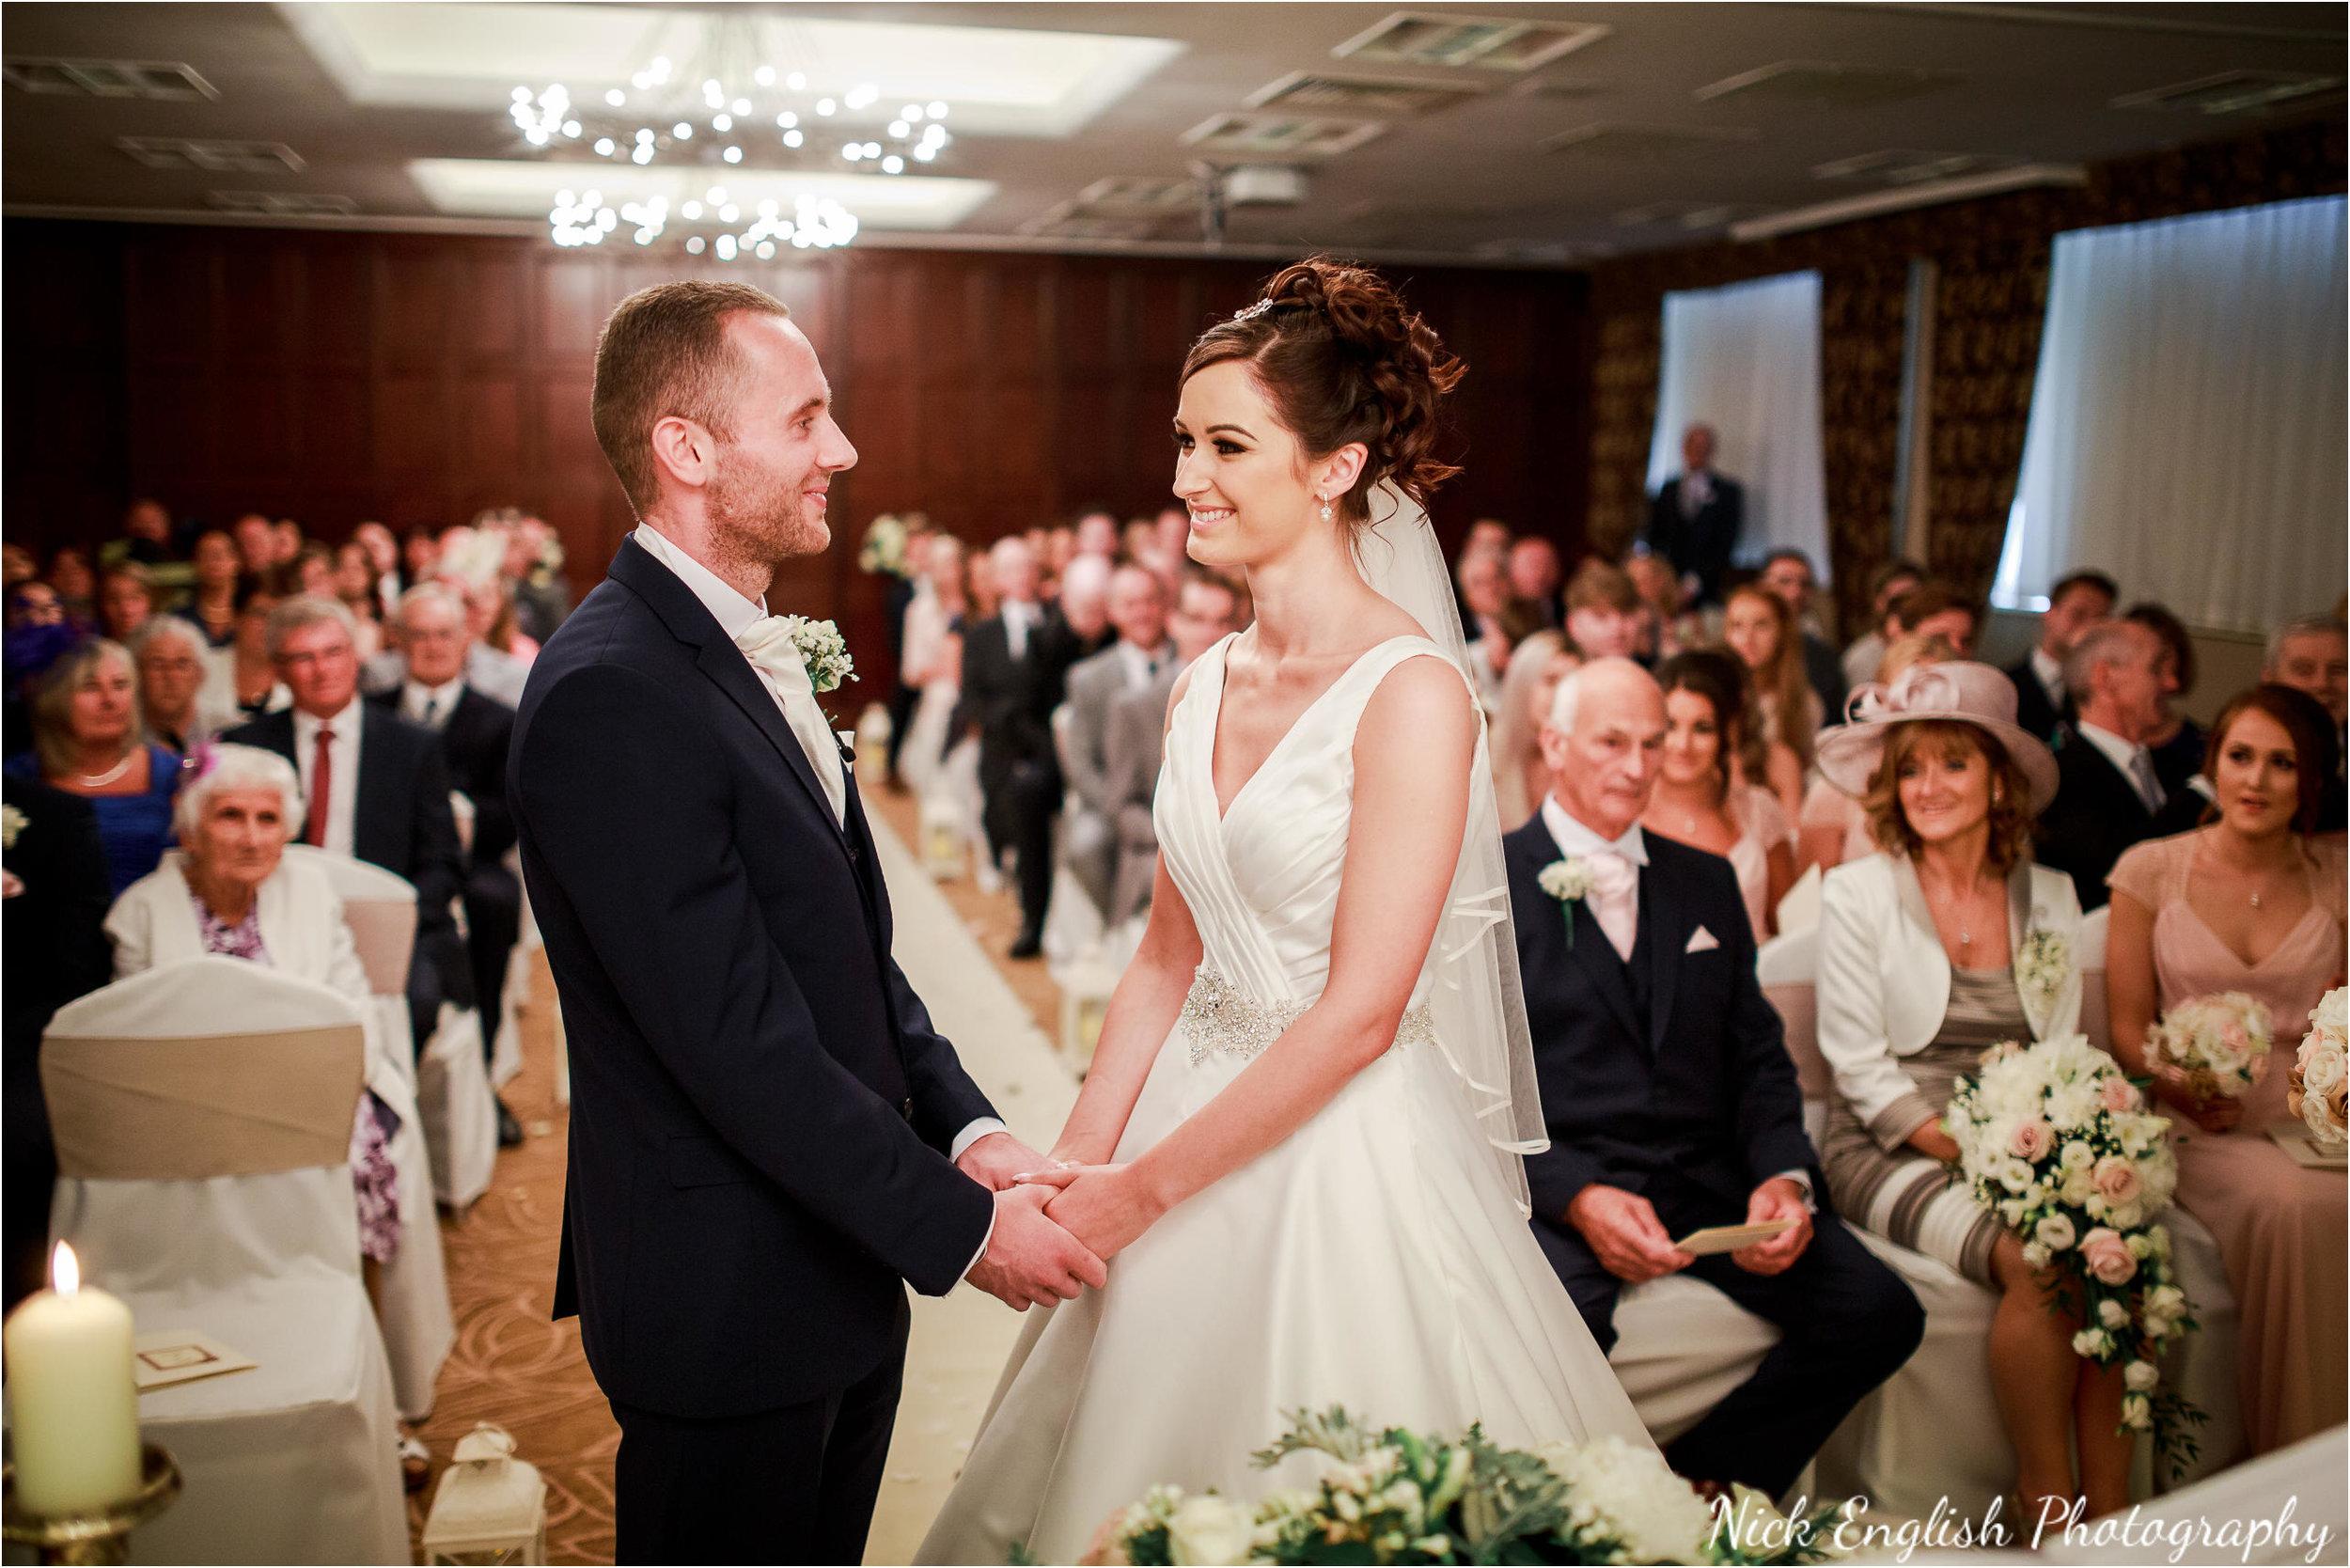 Emily David Wedding Photographs at Barton Grange Preston by Nick English Photography 67jpg.jpeg